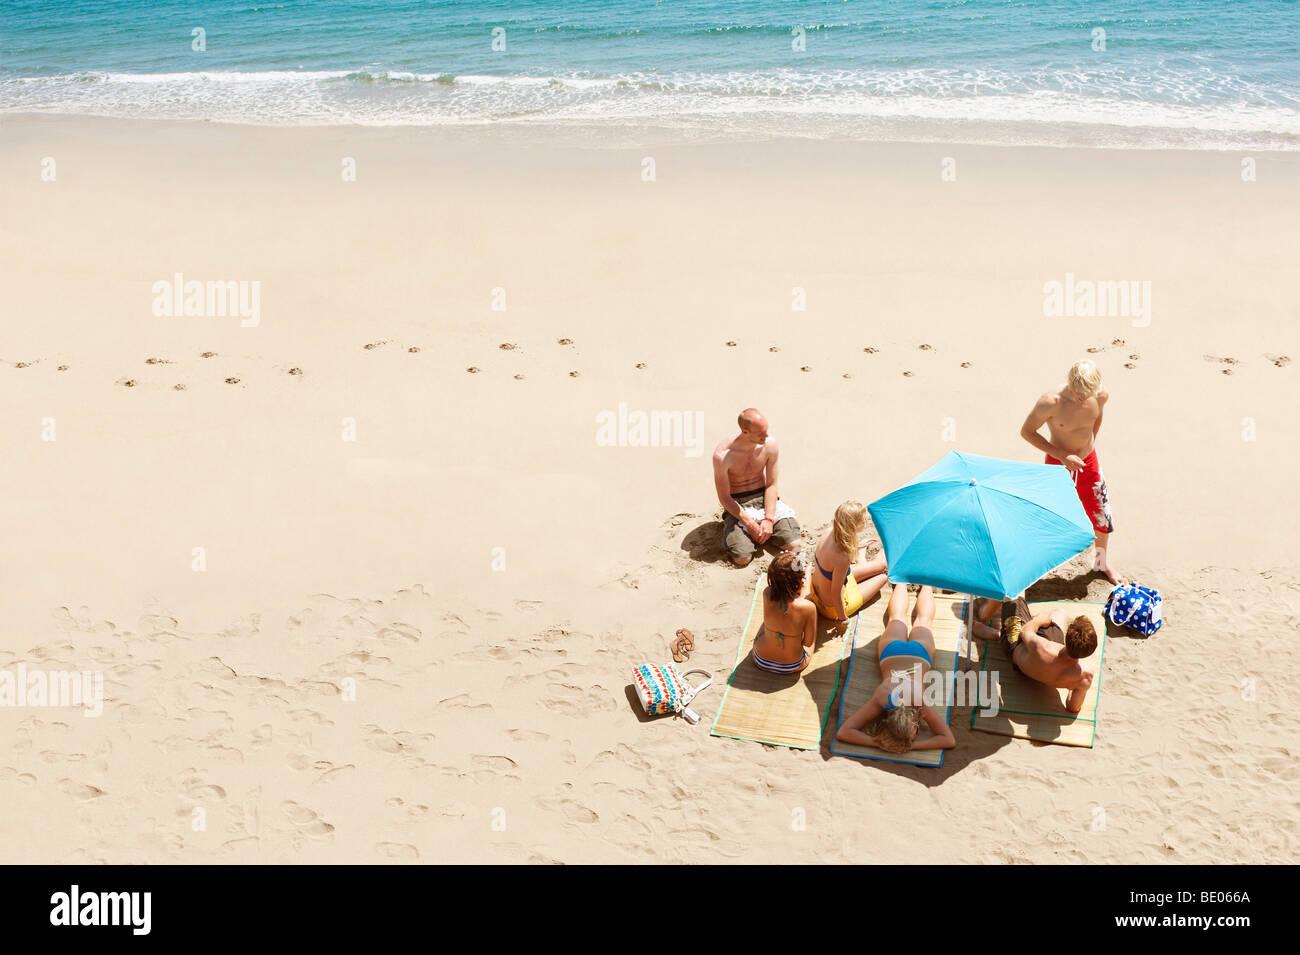 group of people sunbathing on beach - Stock Image